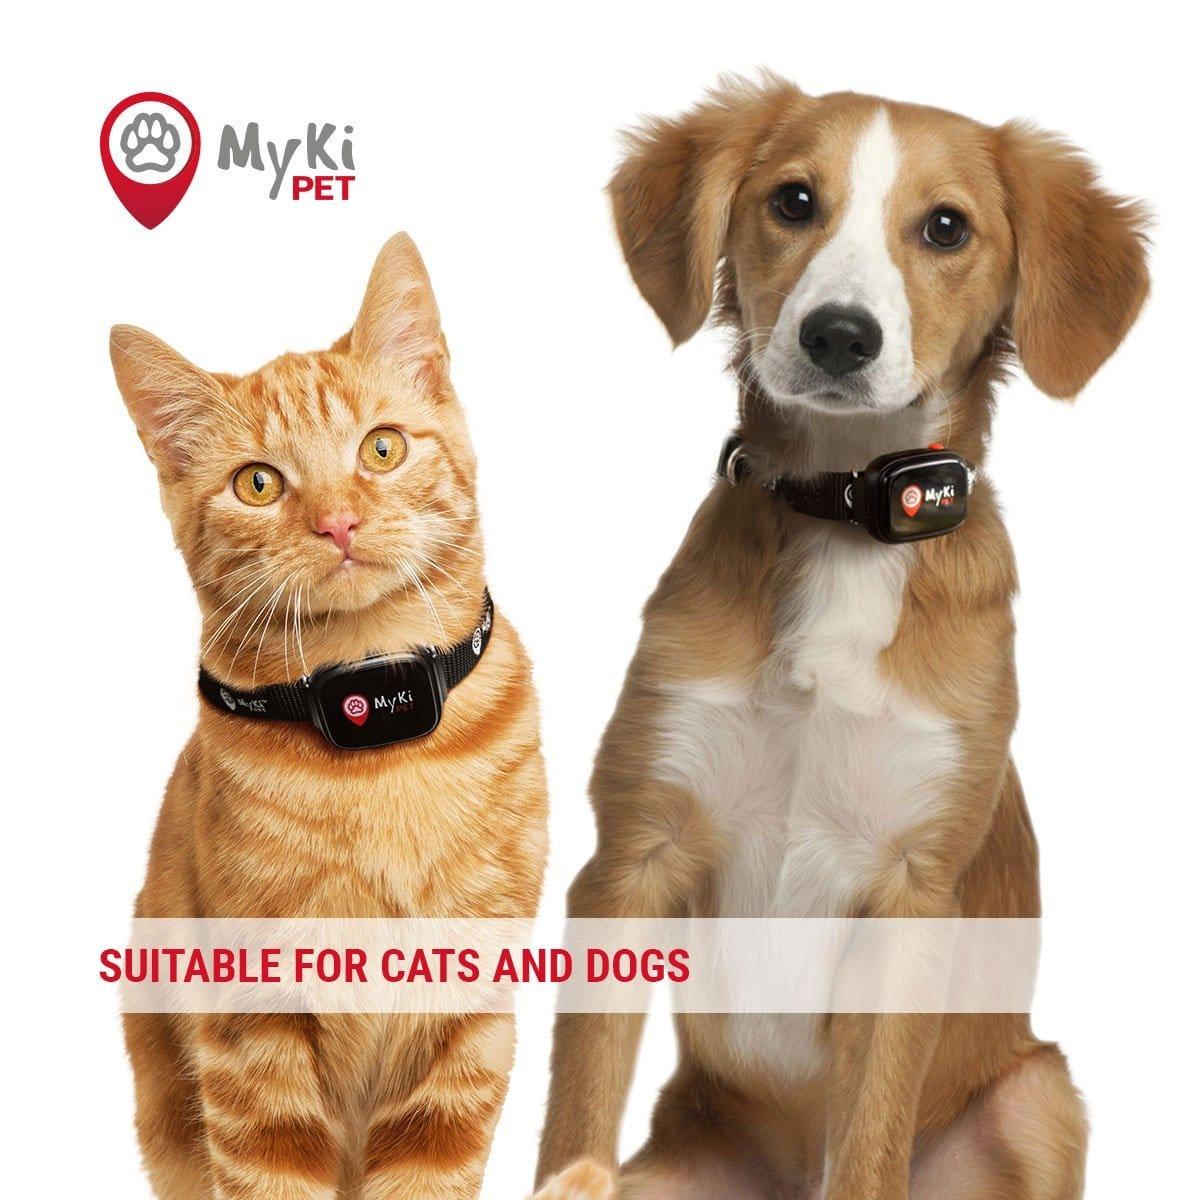 MyKi Pet Real Time GPS/GSM tracker